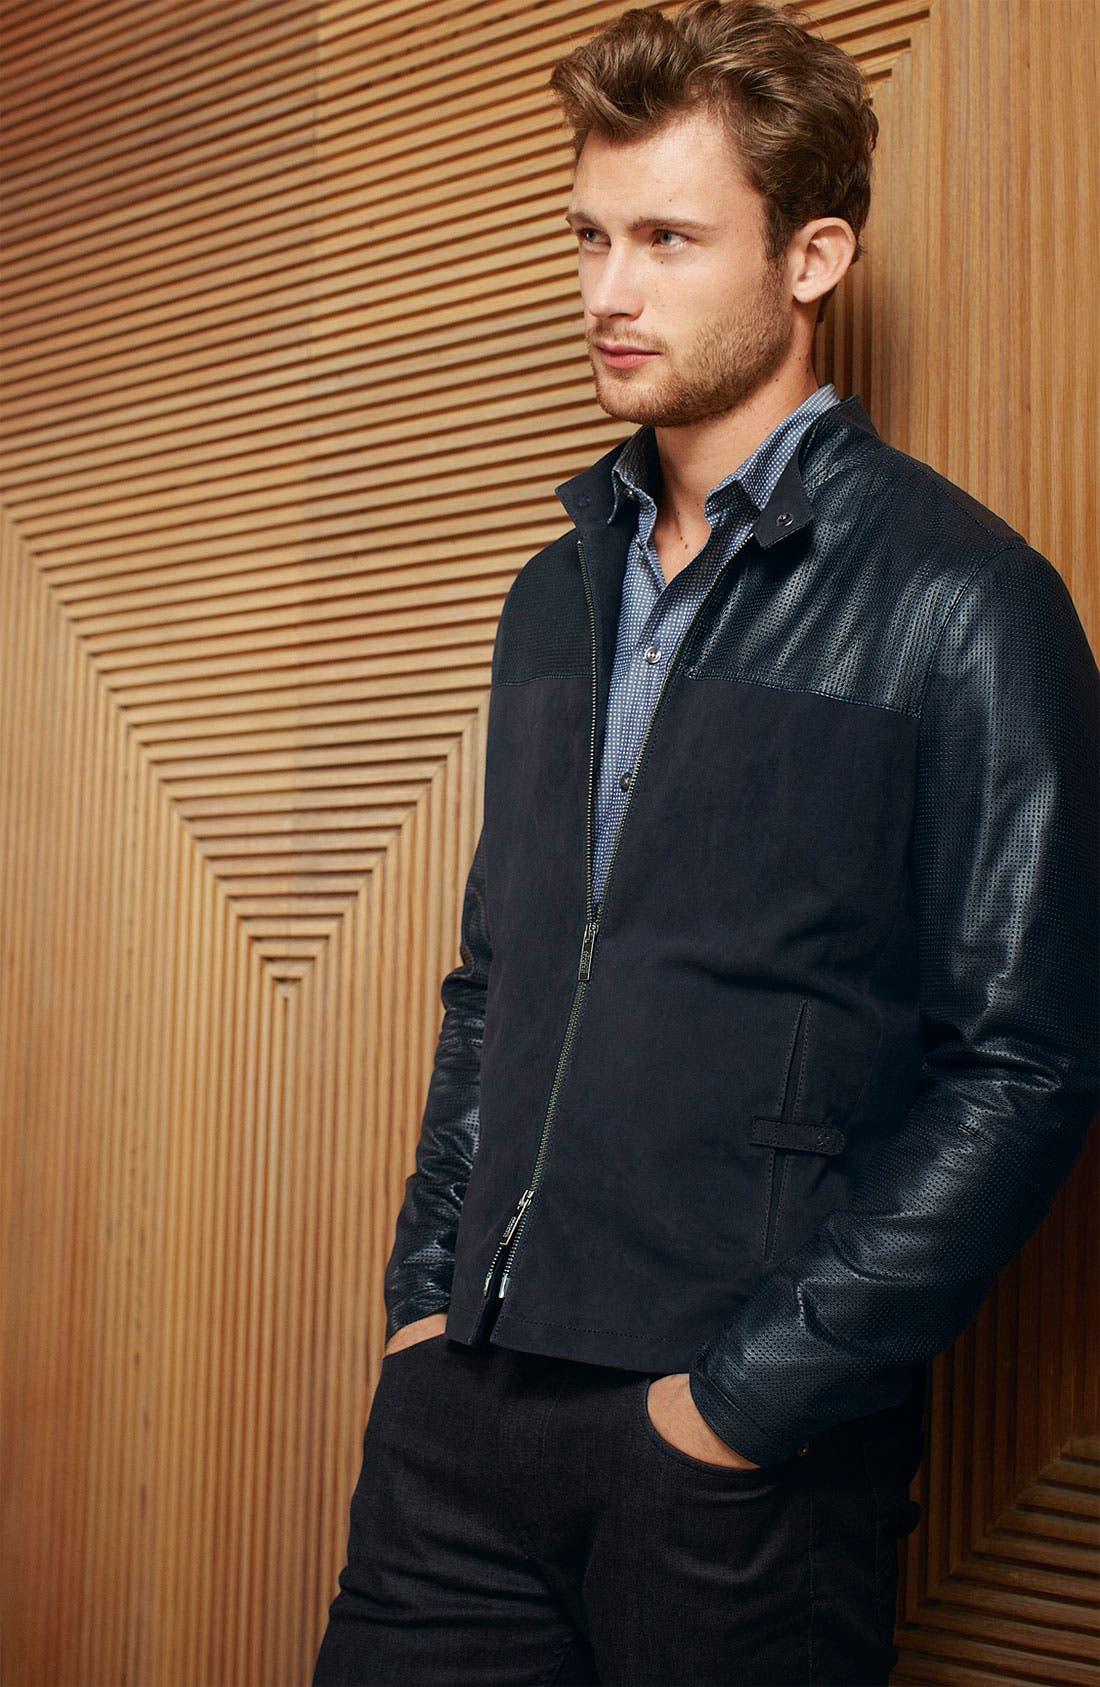 Main Image - Armani Collezioni Jacket, Sport Shirt & Jeans